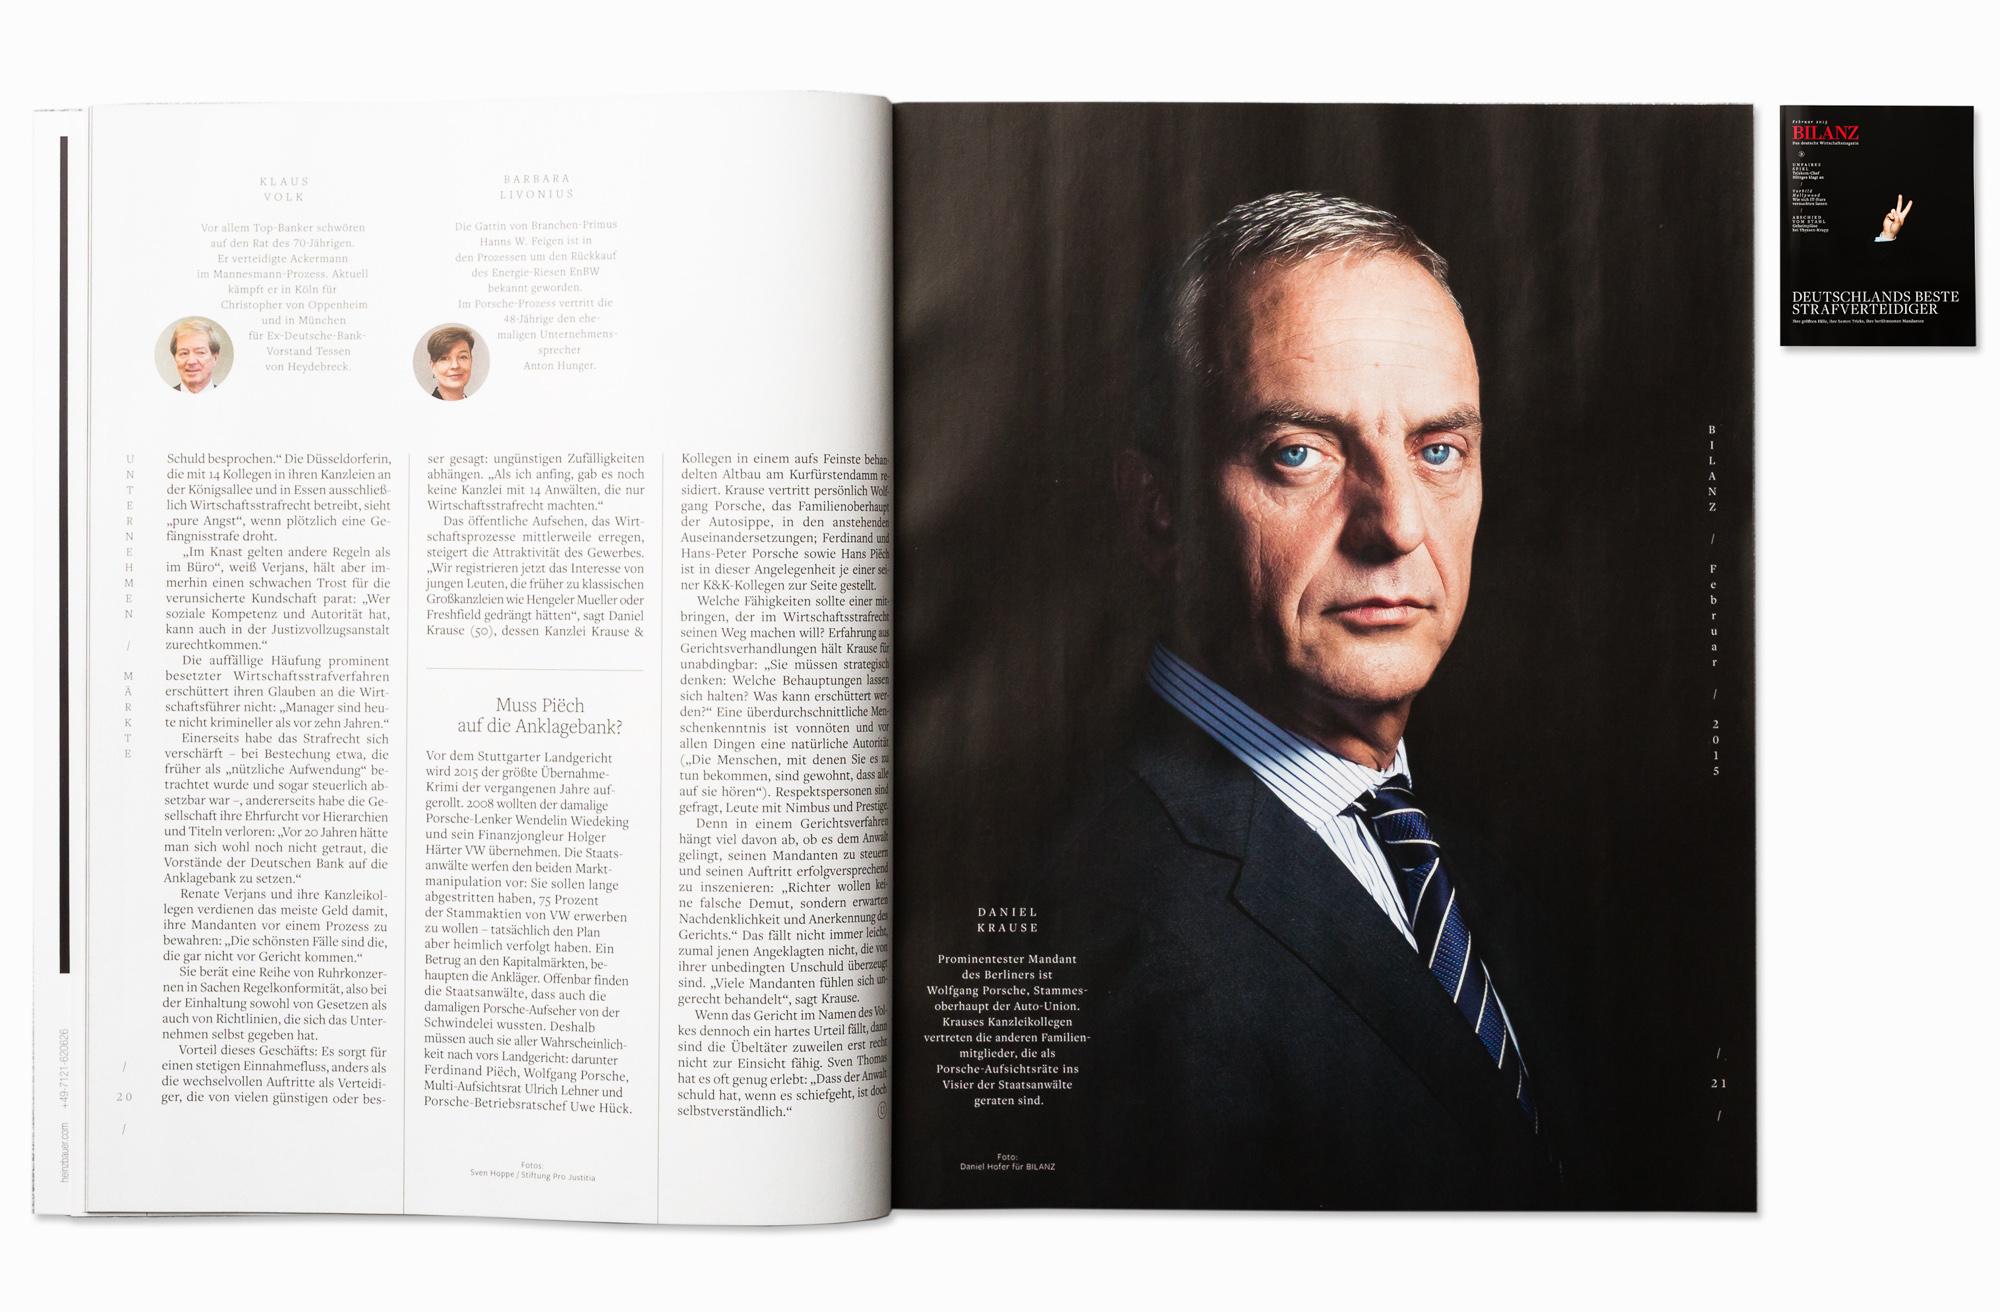 Defense attorney Dr. Daniel Krause for Bilanz Magazine, Berlin 2015